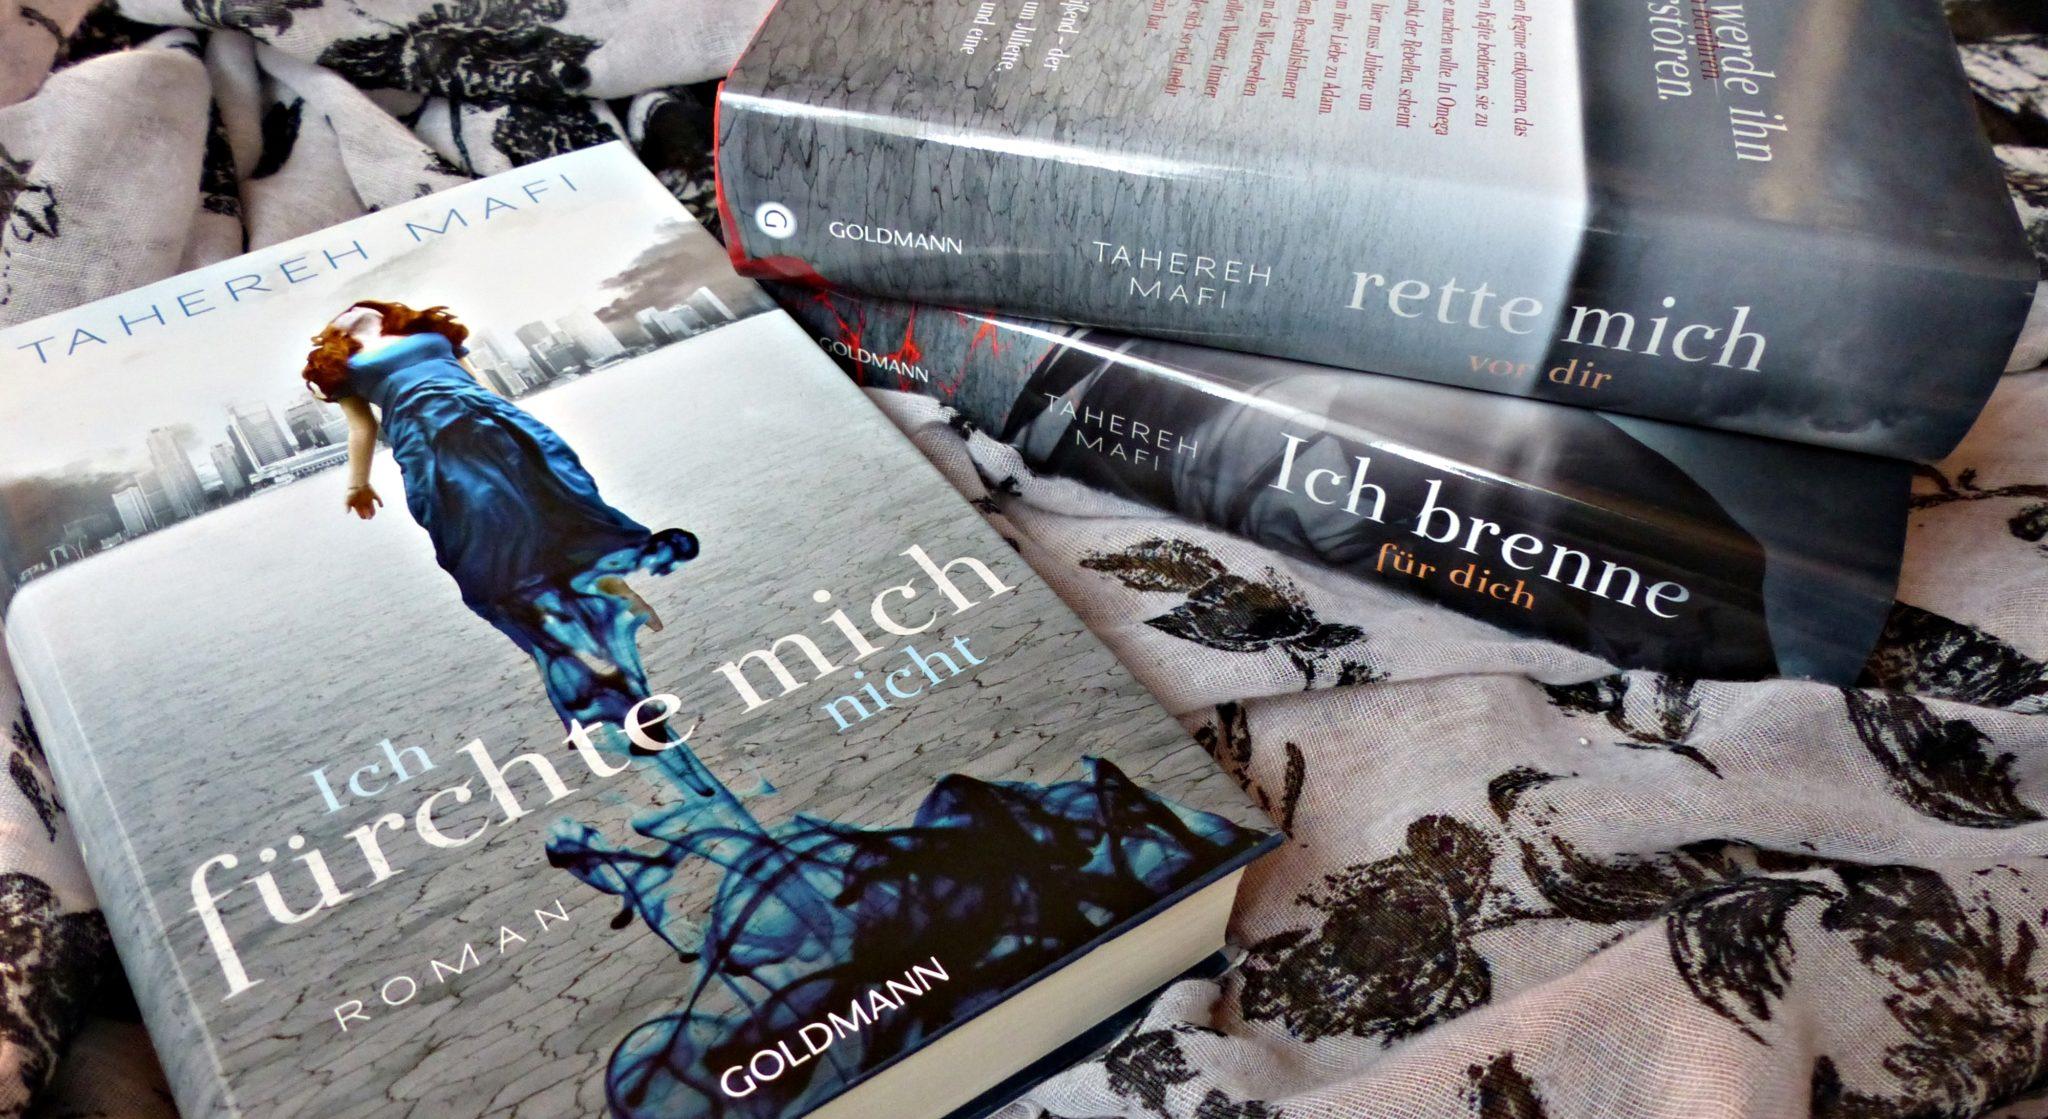 Buchreihe | Shatter me von Tahereh Mafi